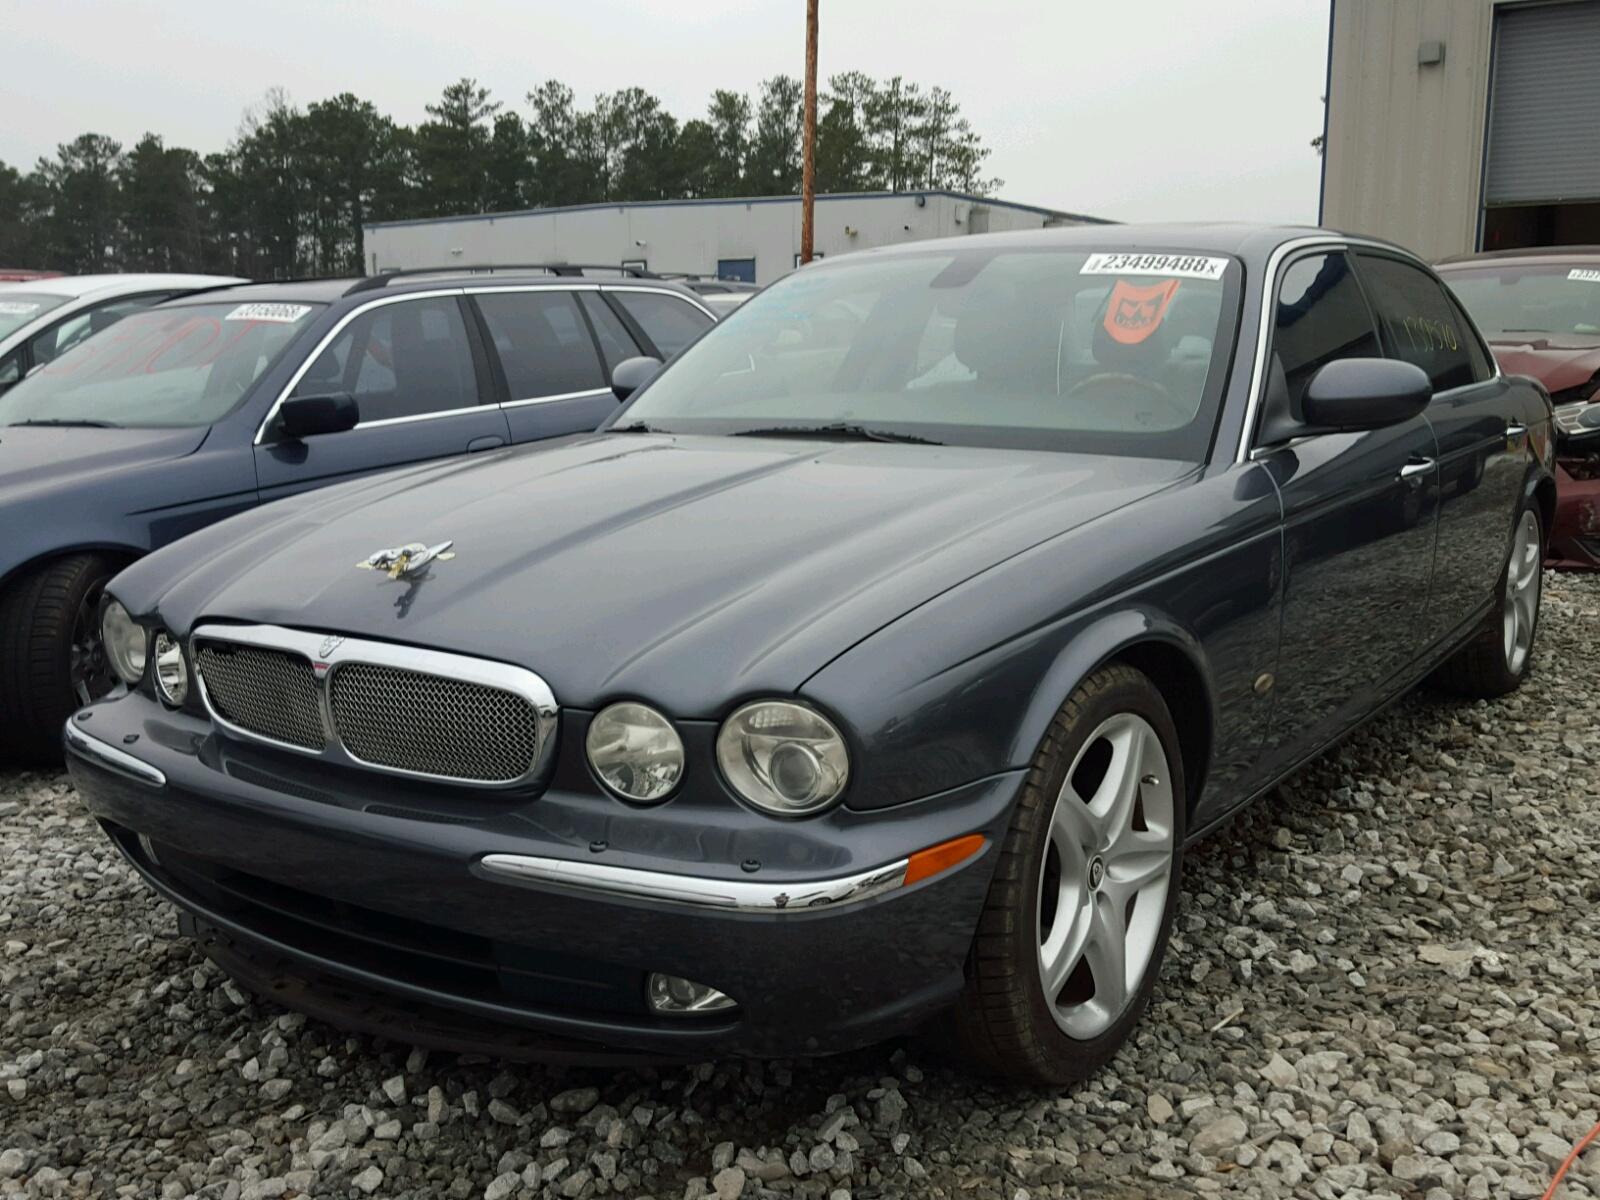 xj v s road super original jaguar test take photo short reviews